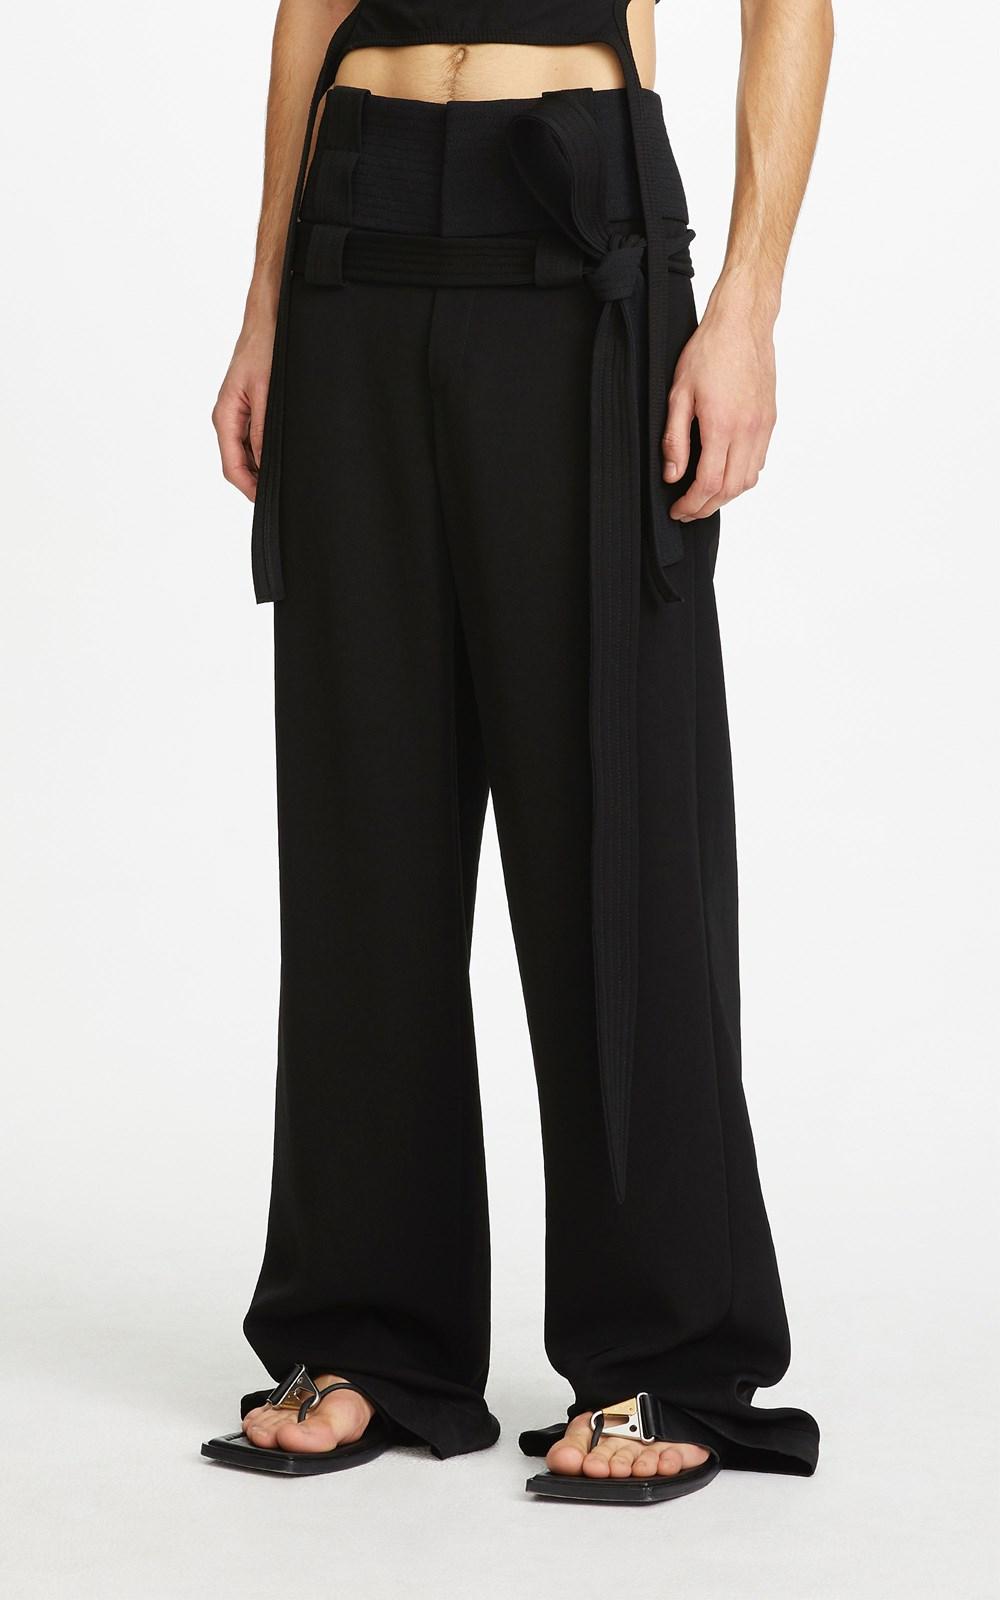 Pants | INTERCHANGE BELTED PANT